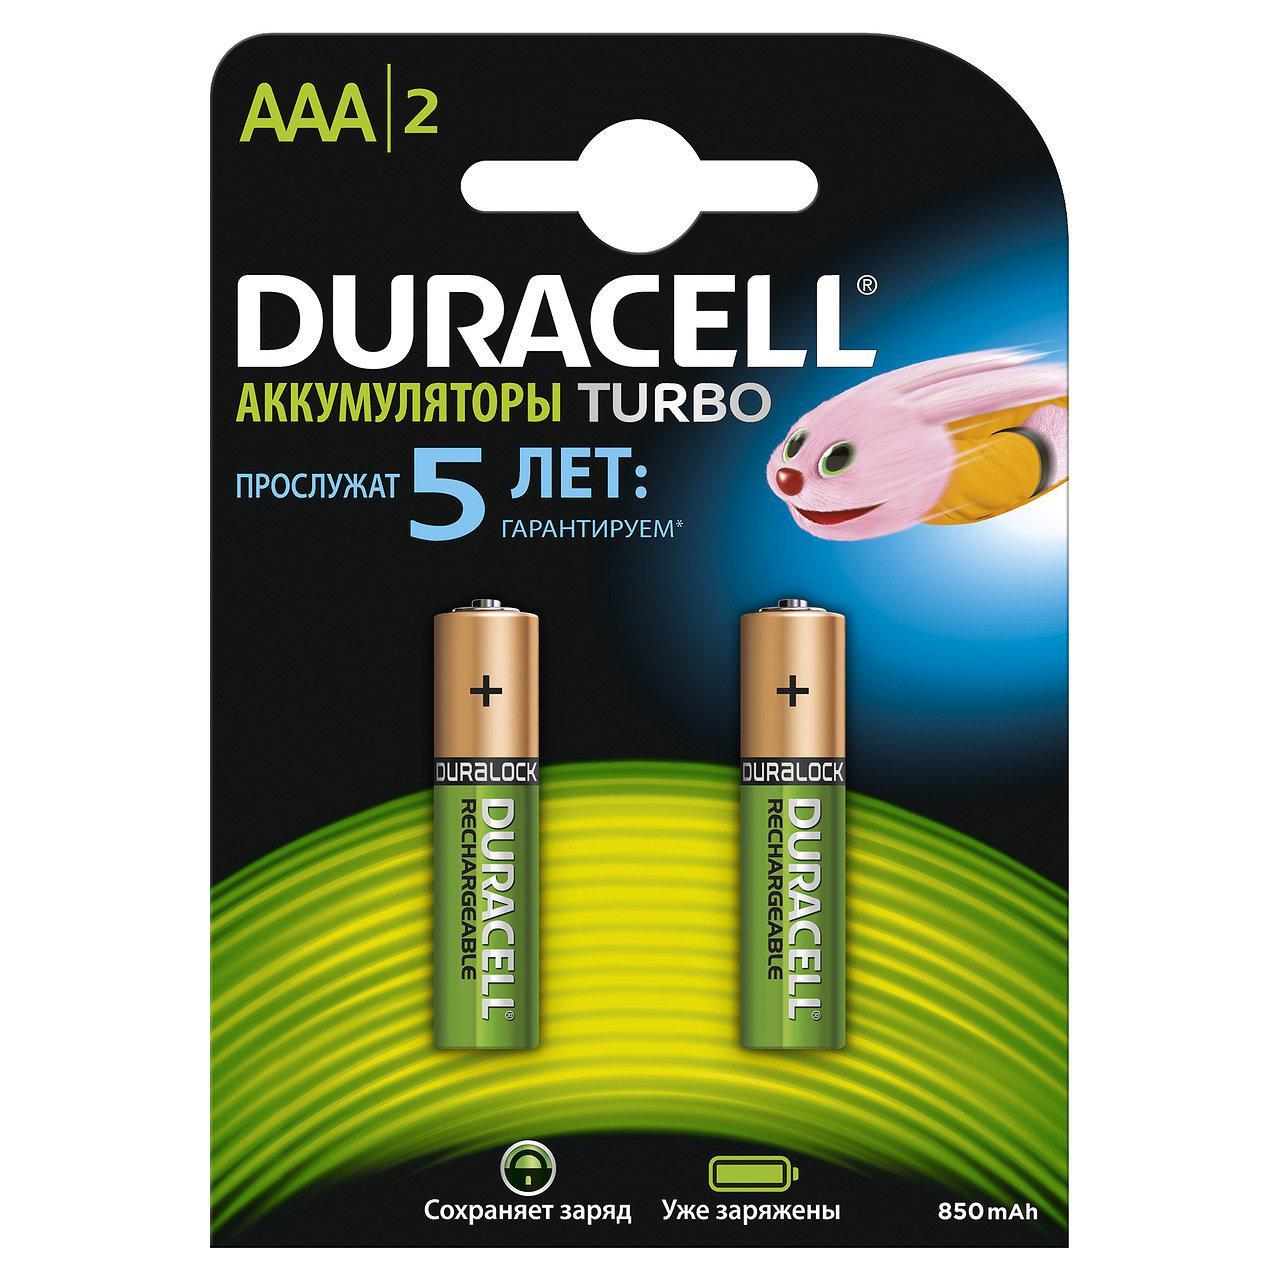 Аккумулятор Duracell Hr03-2bl (2/20/12800) 2шт duracell lr6 2bl turbo 2шт aa